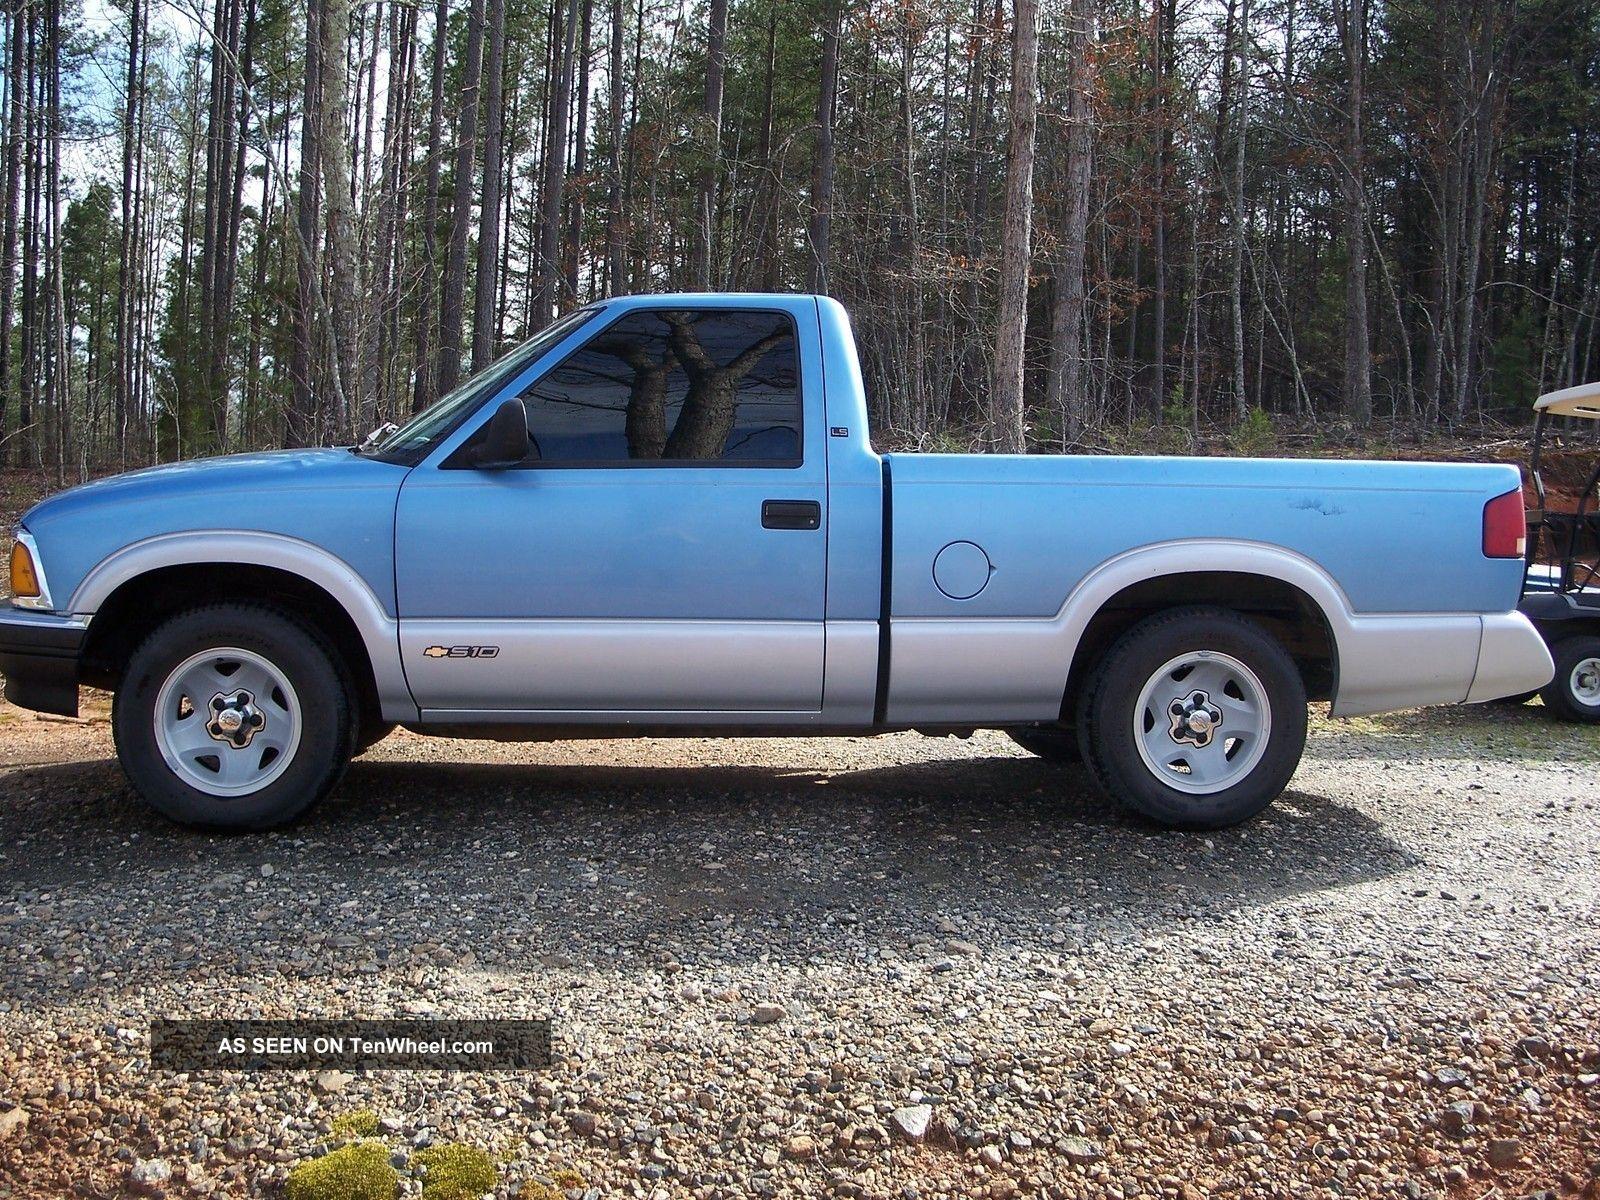 1997 chevrolet s10 truck ls 2 2 4 cylinder automatic. Black Bedroom Furniture Sets. Home Design Ideas